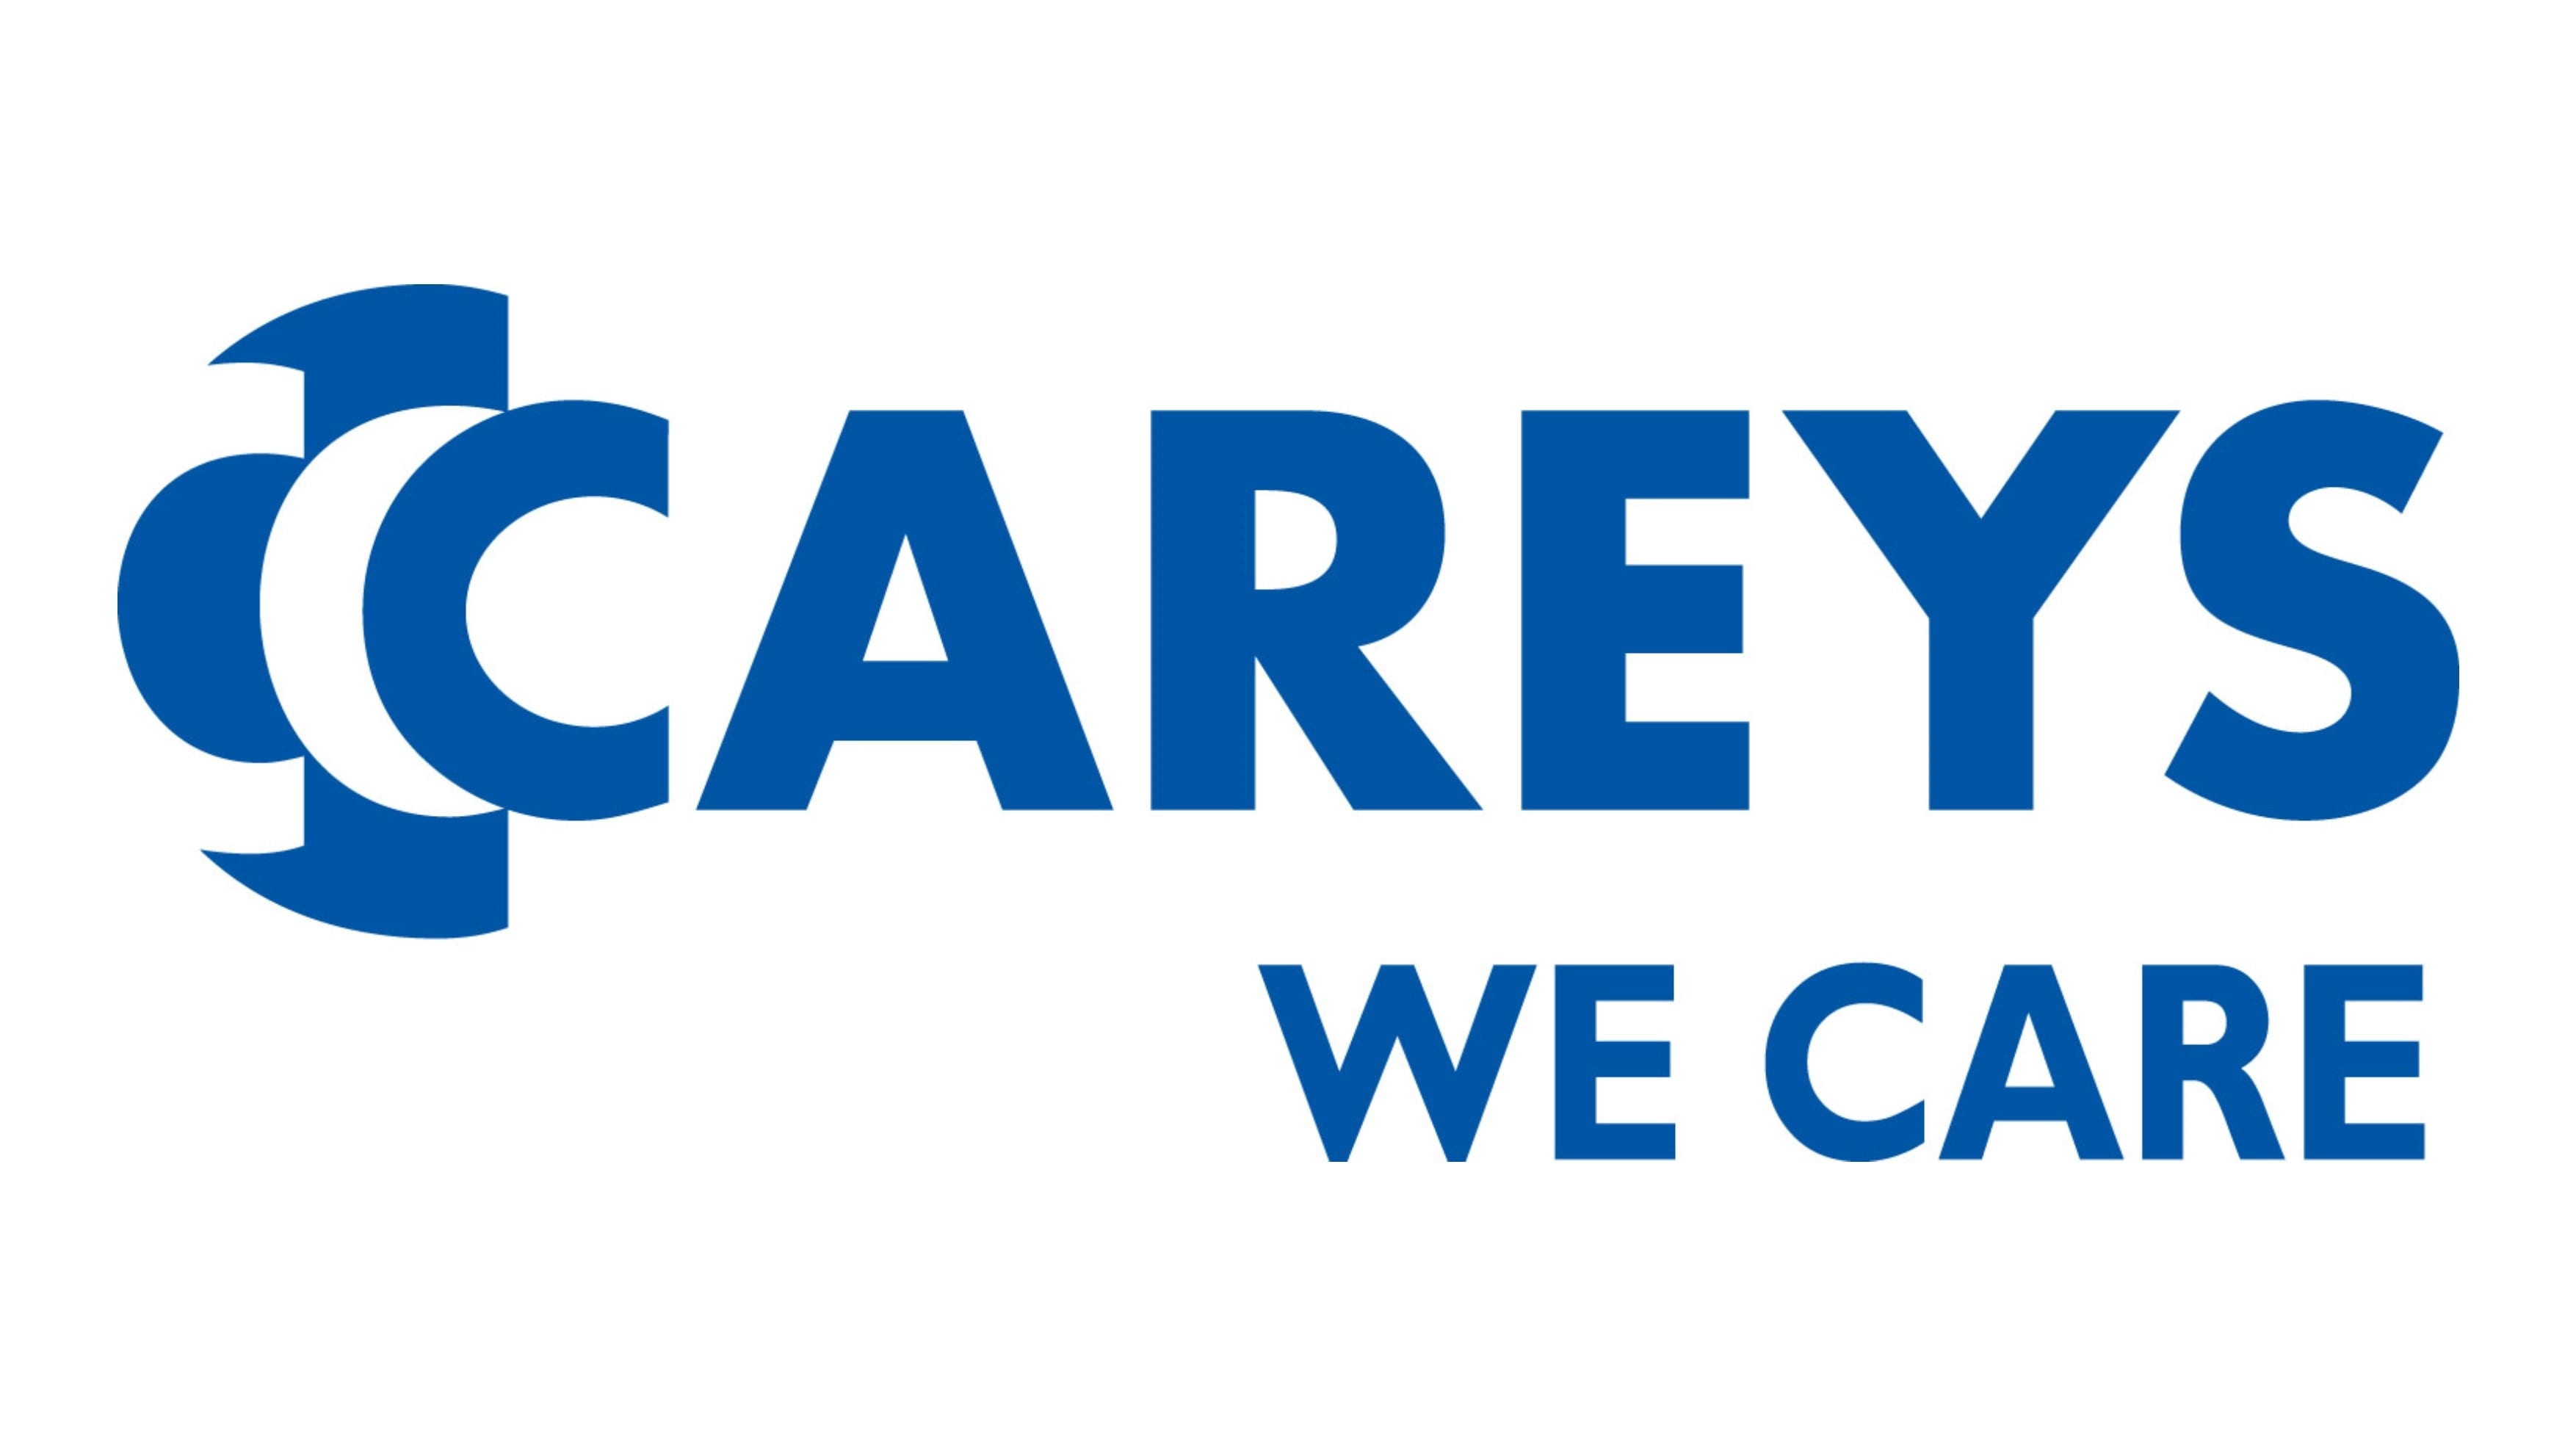 Careys-web-logo